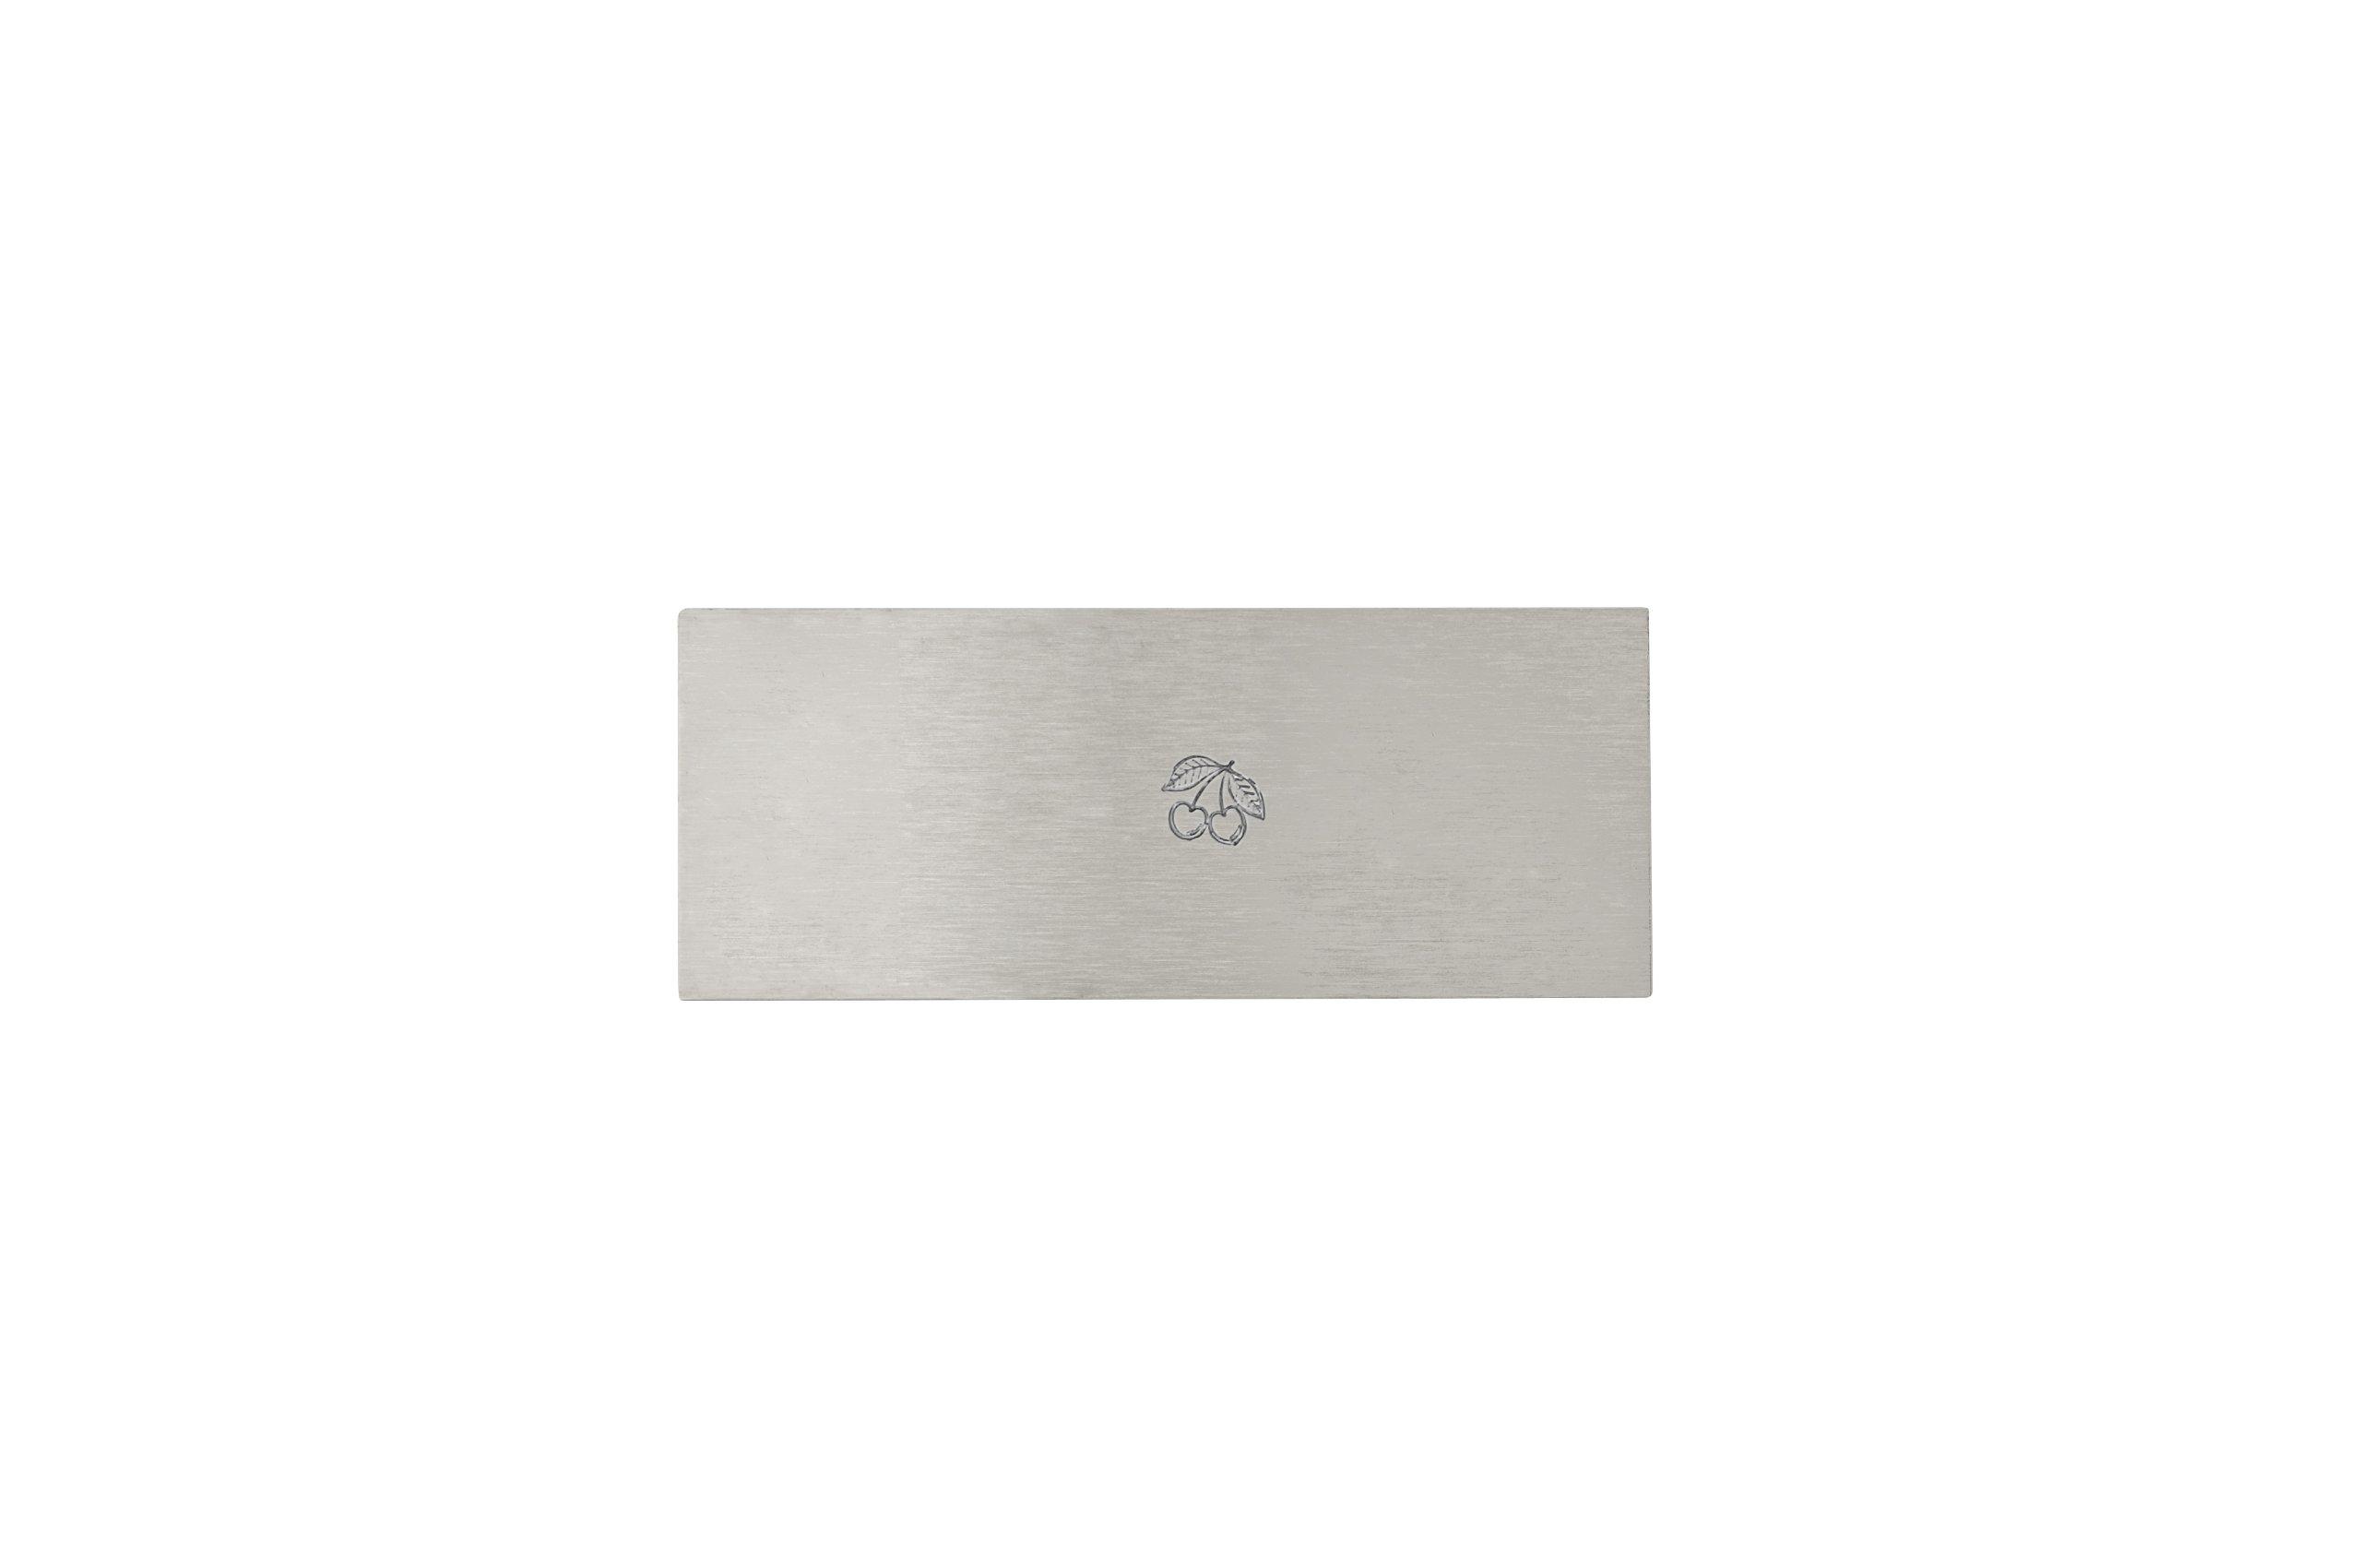 Kirschen 3800008 Cabinet Scraper 0,8 mm